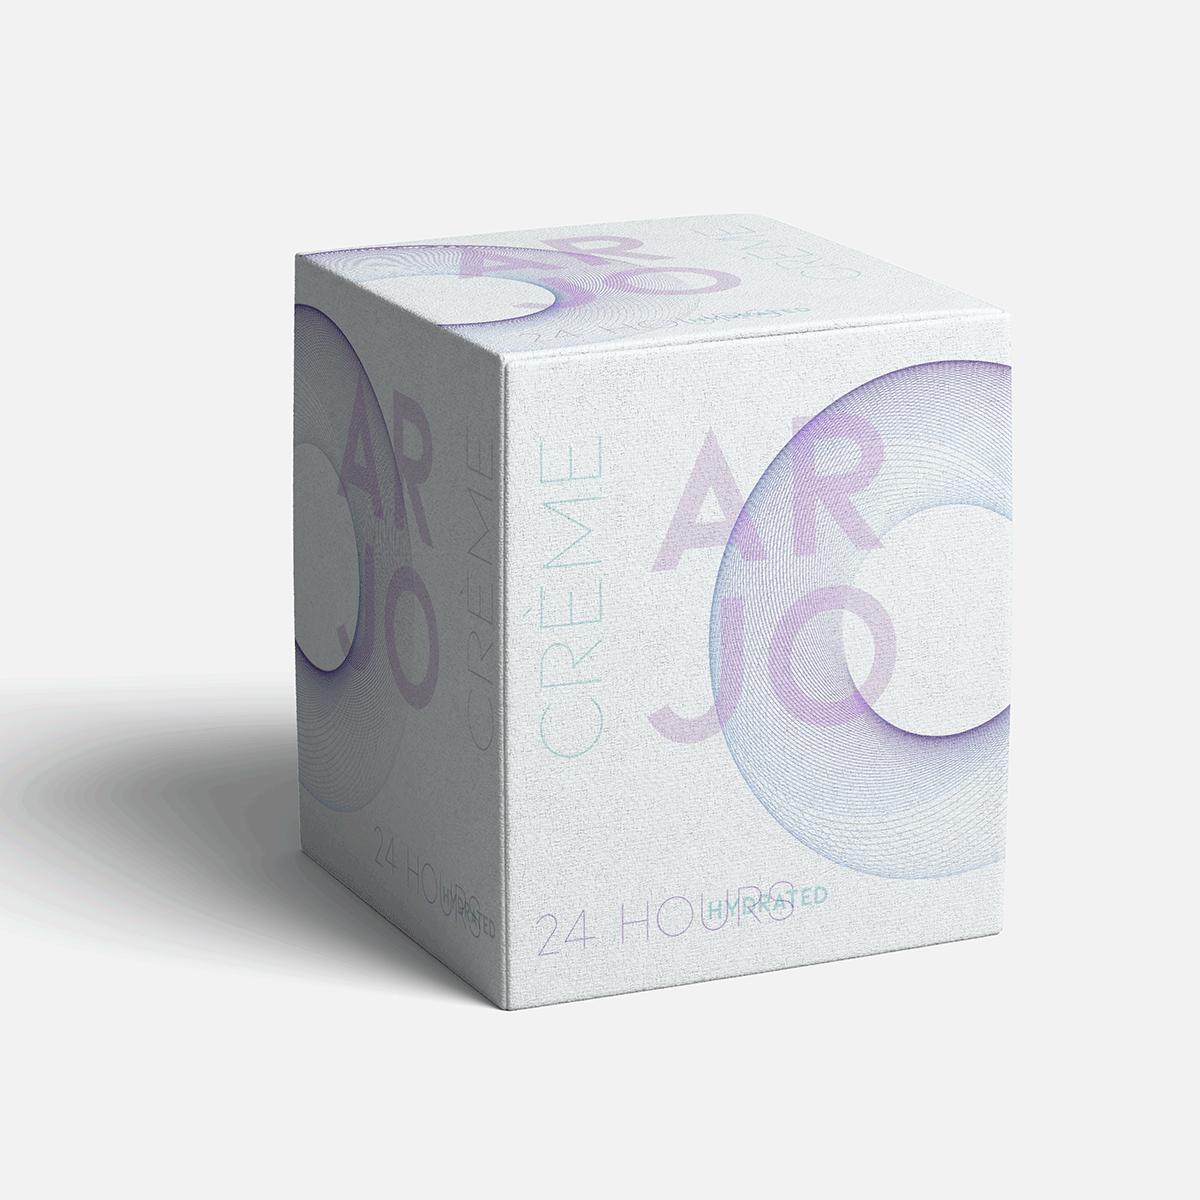 A fictional packaging design using a spirograph